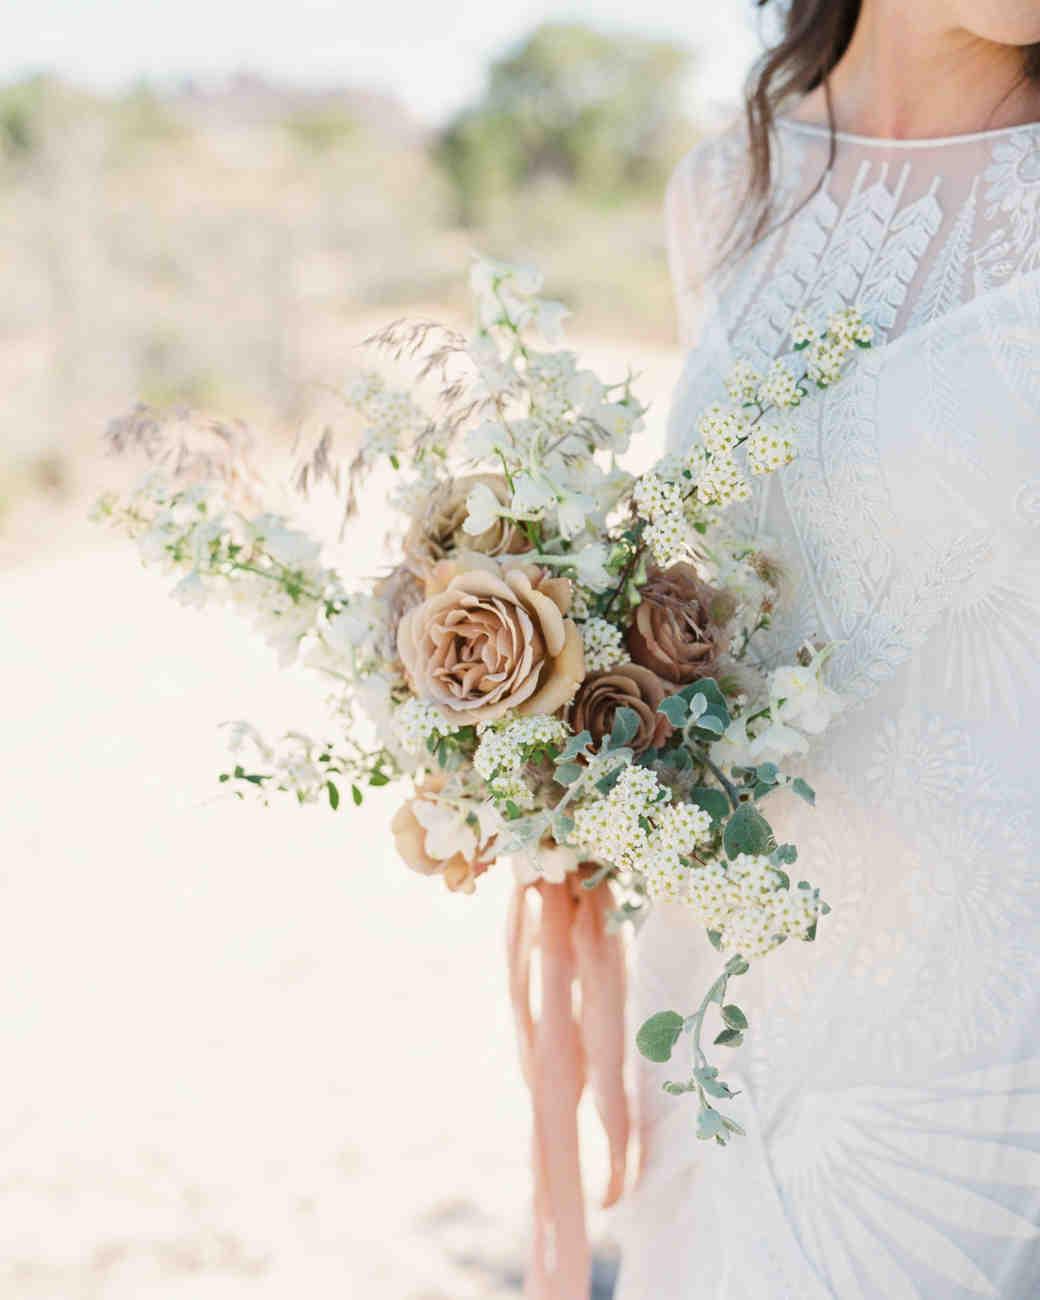 jeanette david wedding desert bouquet bride